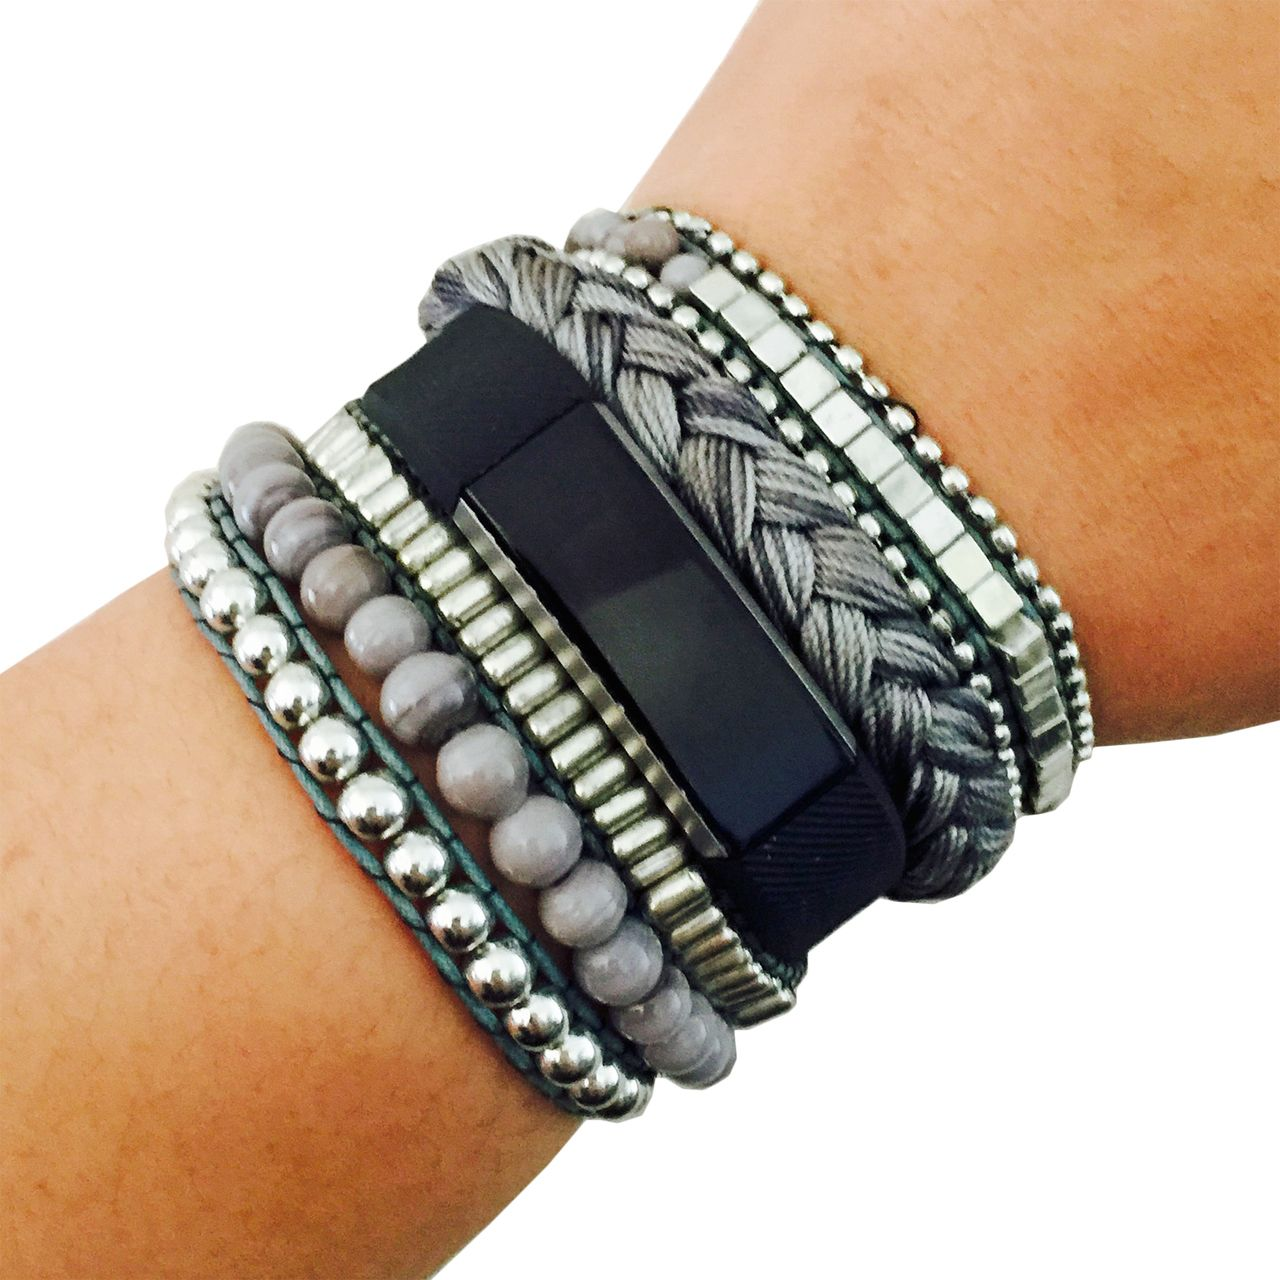 The rosie in grey for fitbit altaalta hr fitbit bracelet fitbit